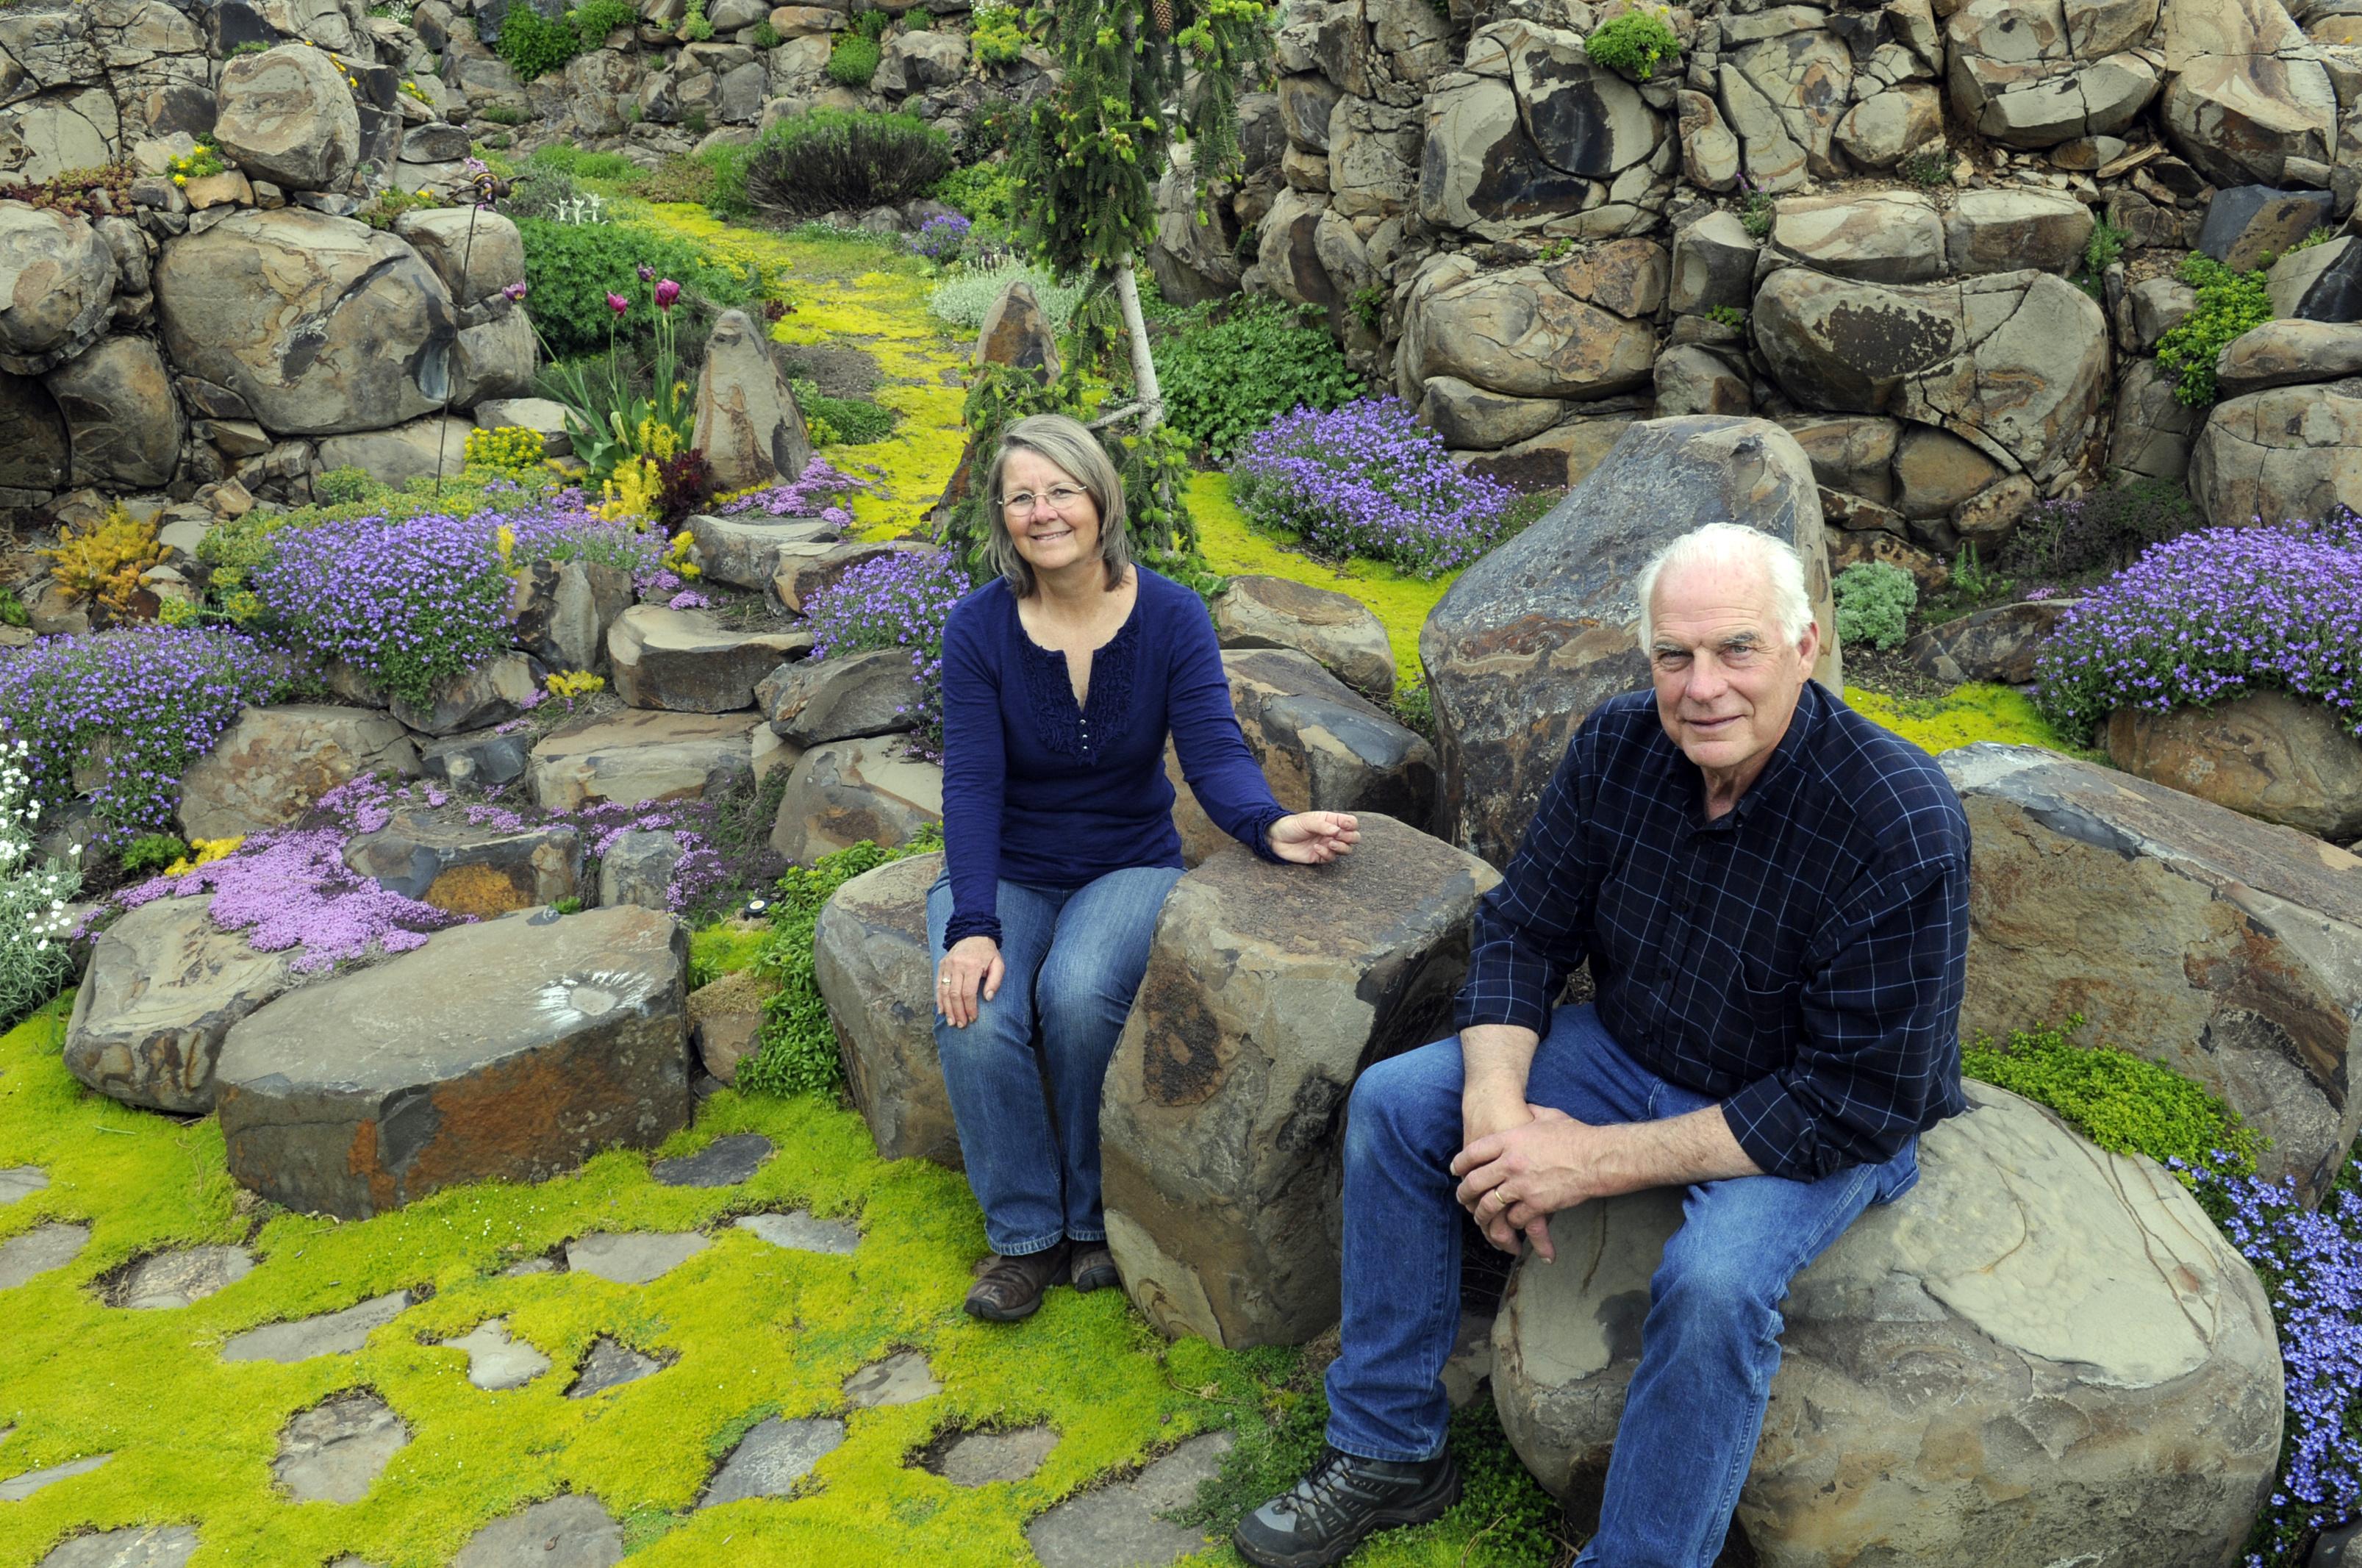 Basalt Rock Gardening : Expect quite a show at upcoming garden tour the